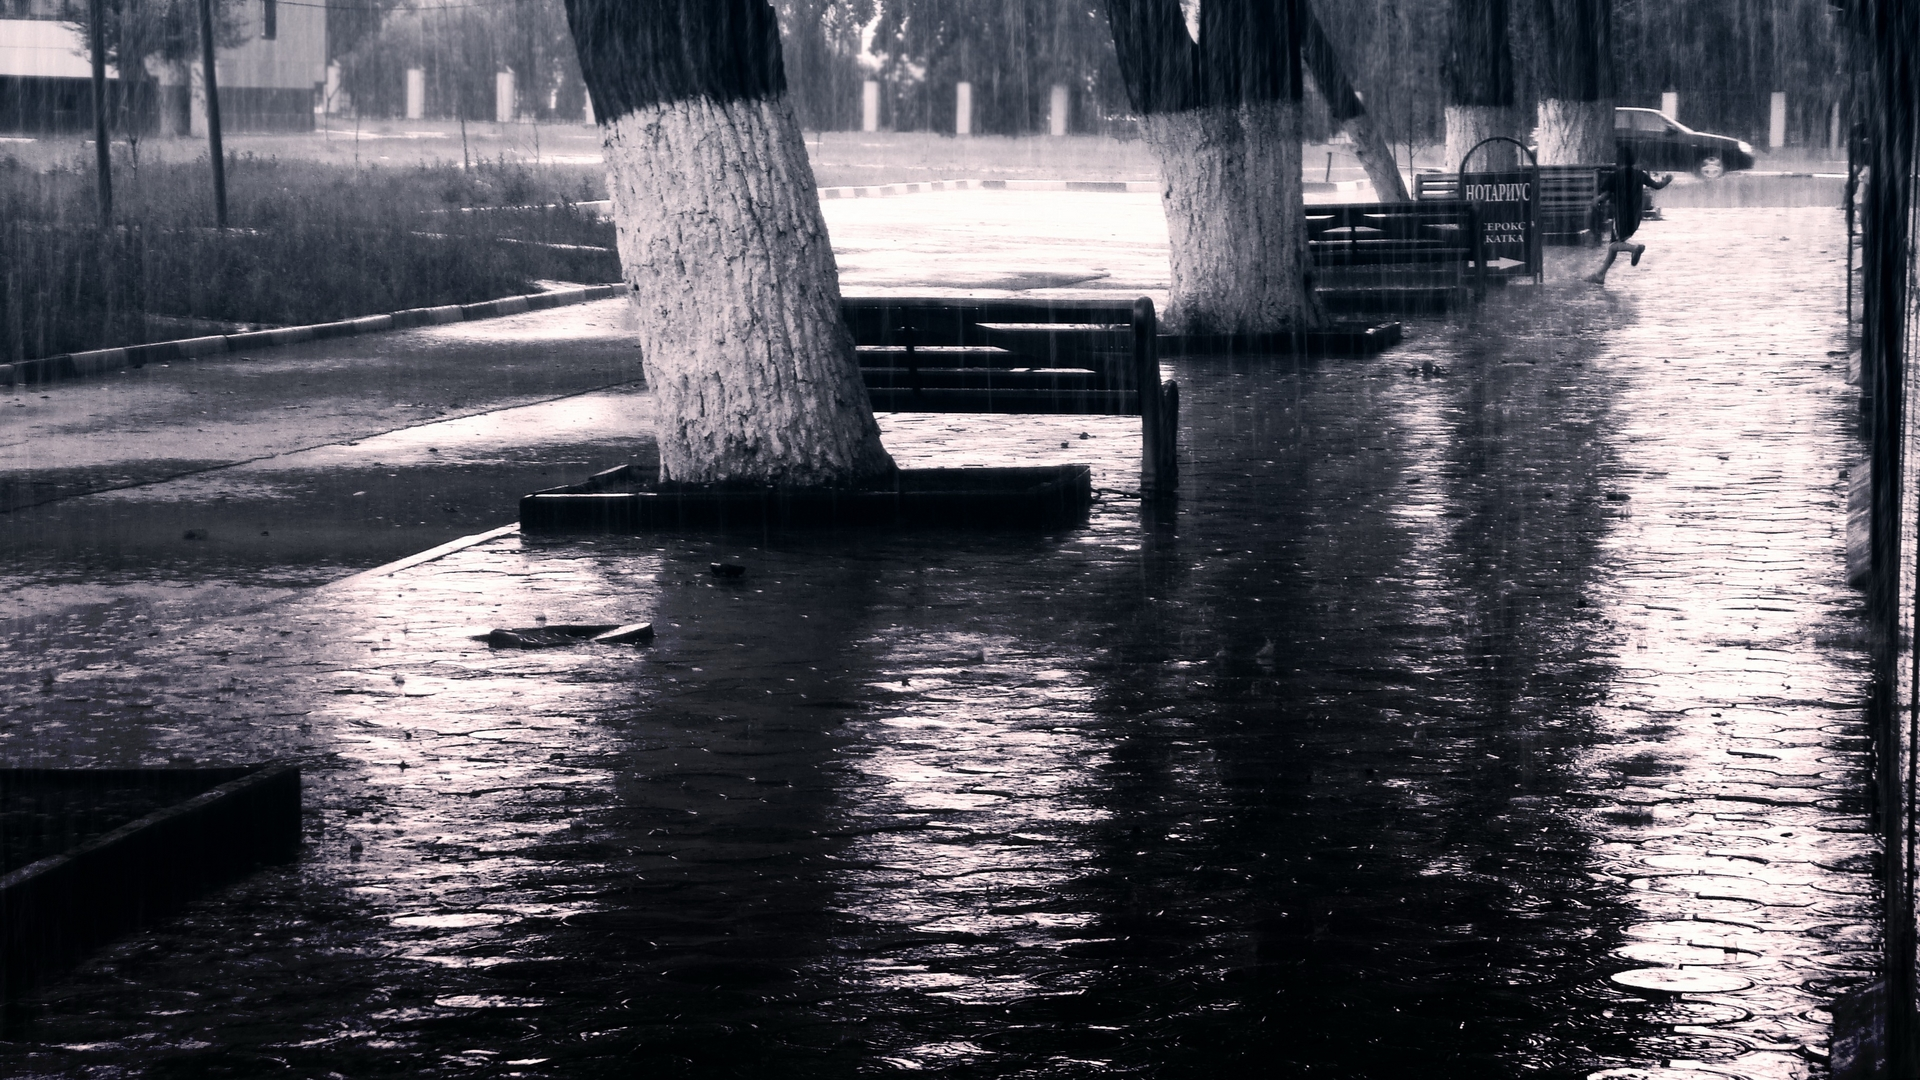 Rain Full HD Wallpaper and Background | 1920x1080 | ID:425801